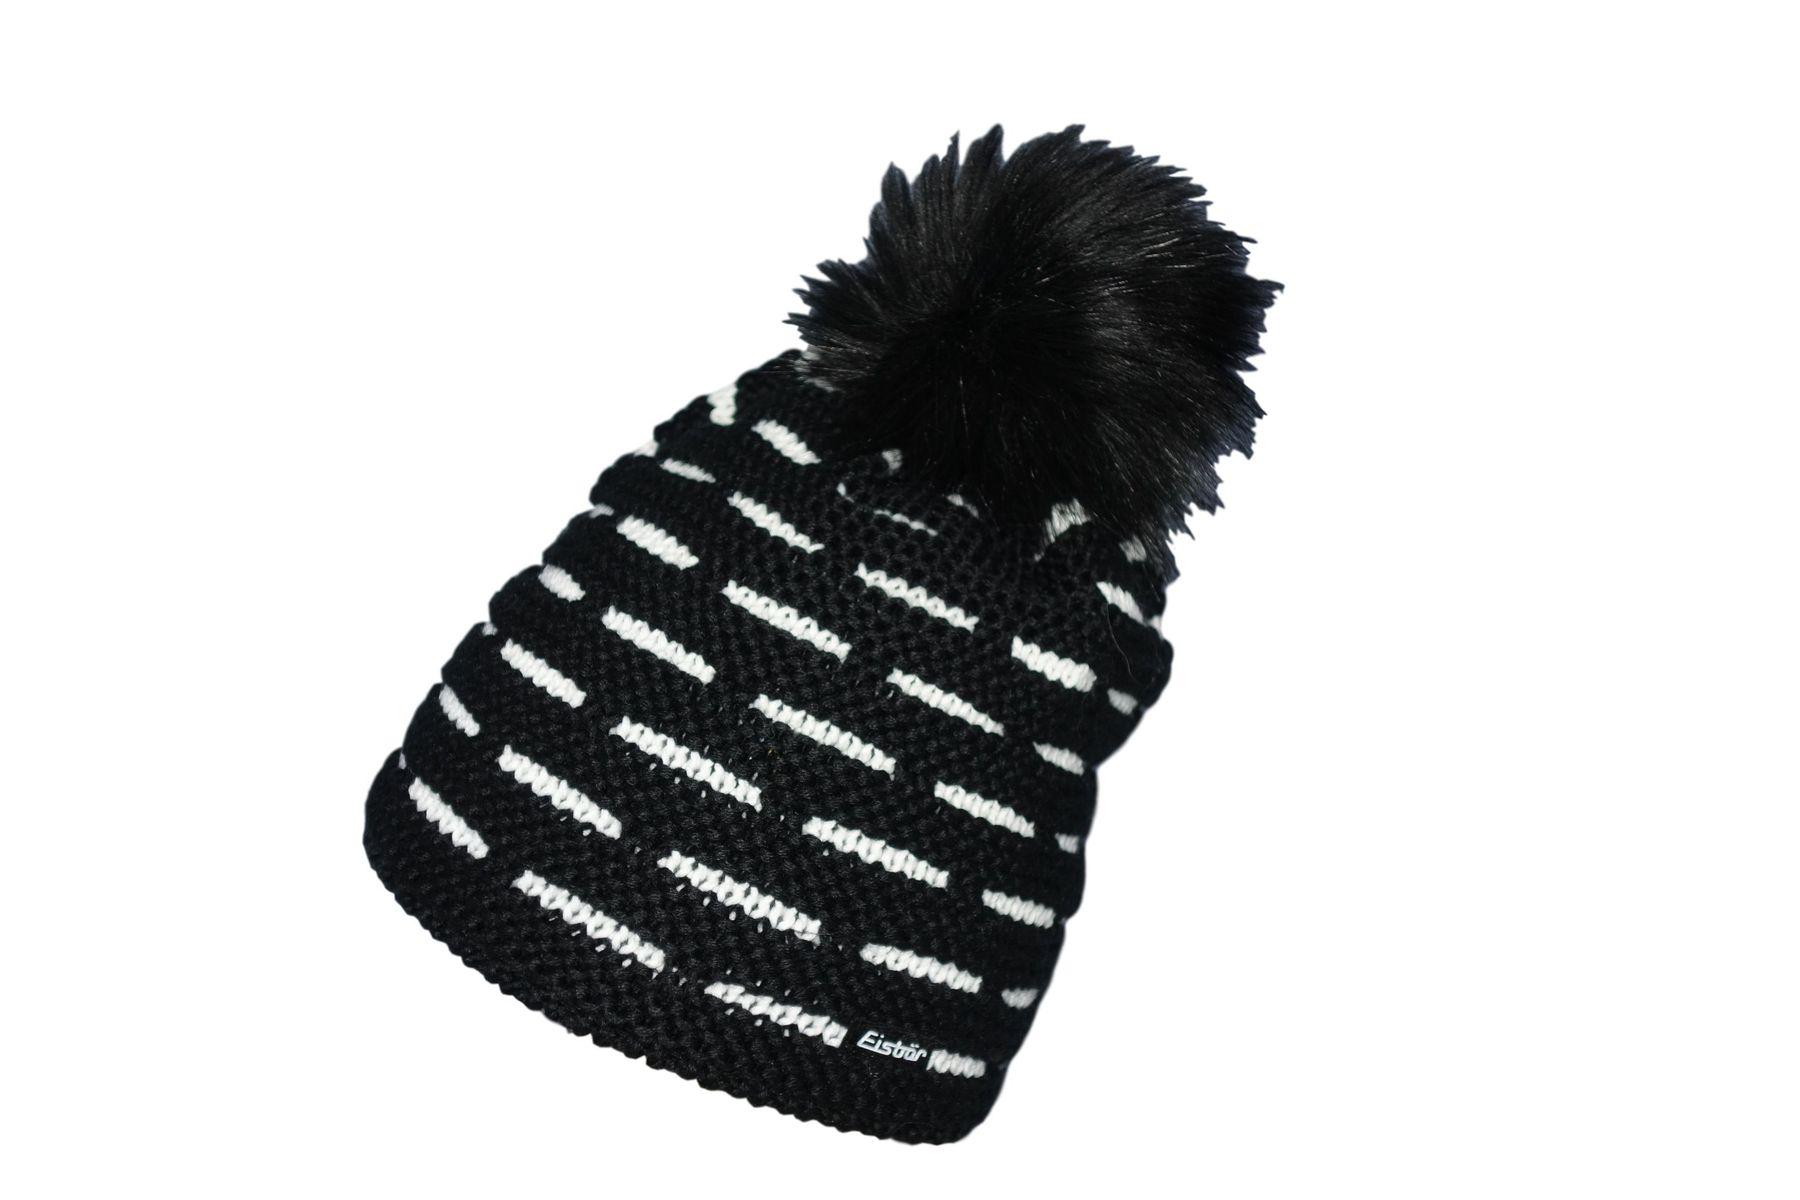 Eisbär Aldona Lux Mütze- schwarz